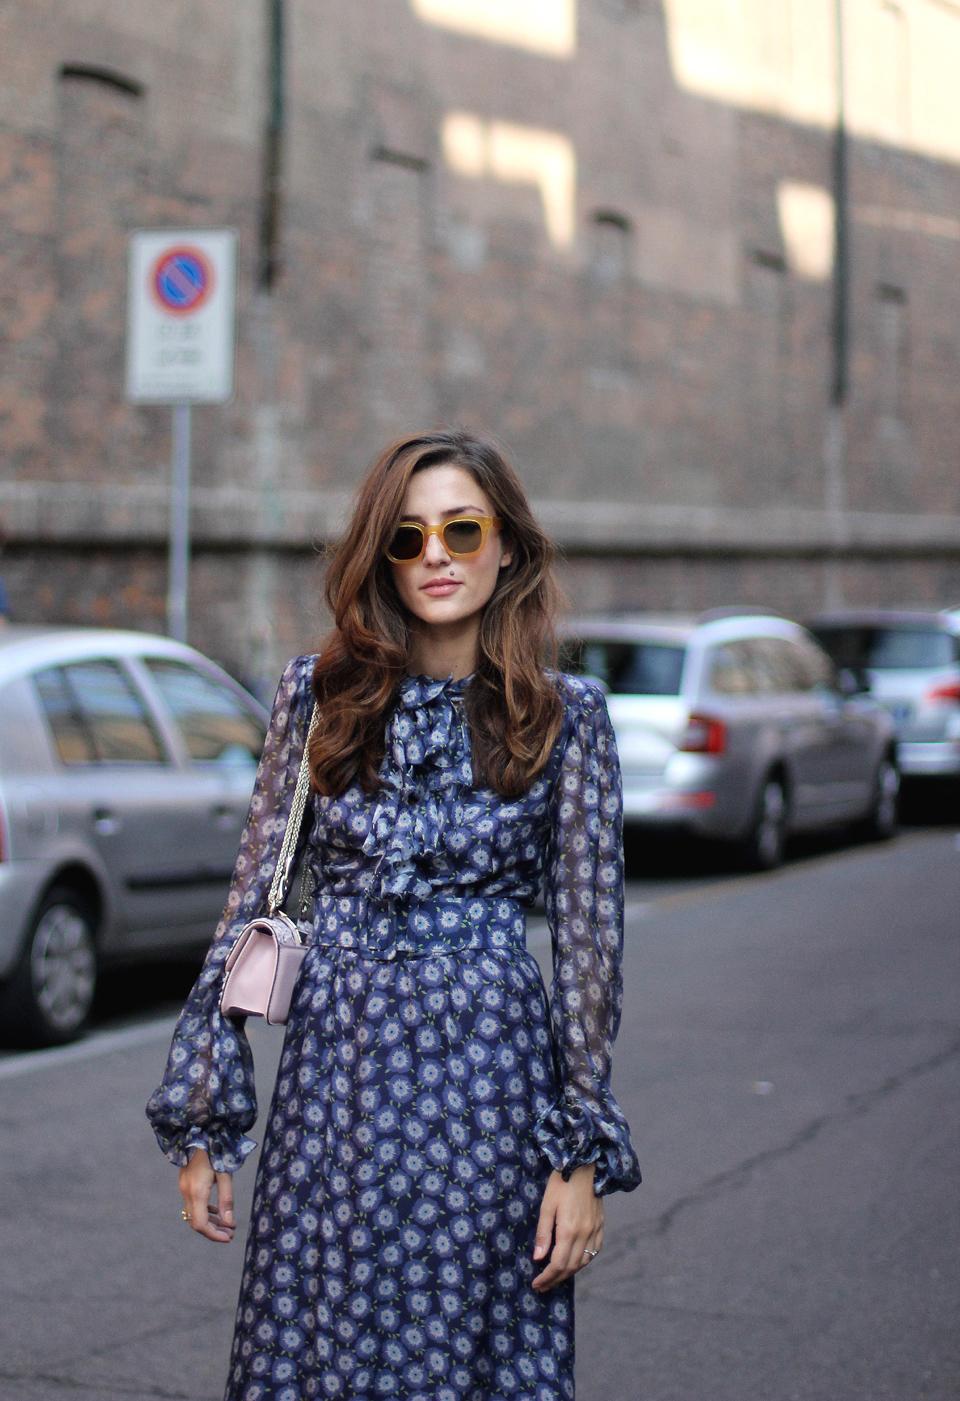 Eleonora-Carisi-Street-Style-Milan (2)